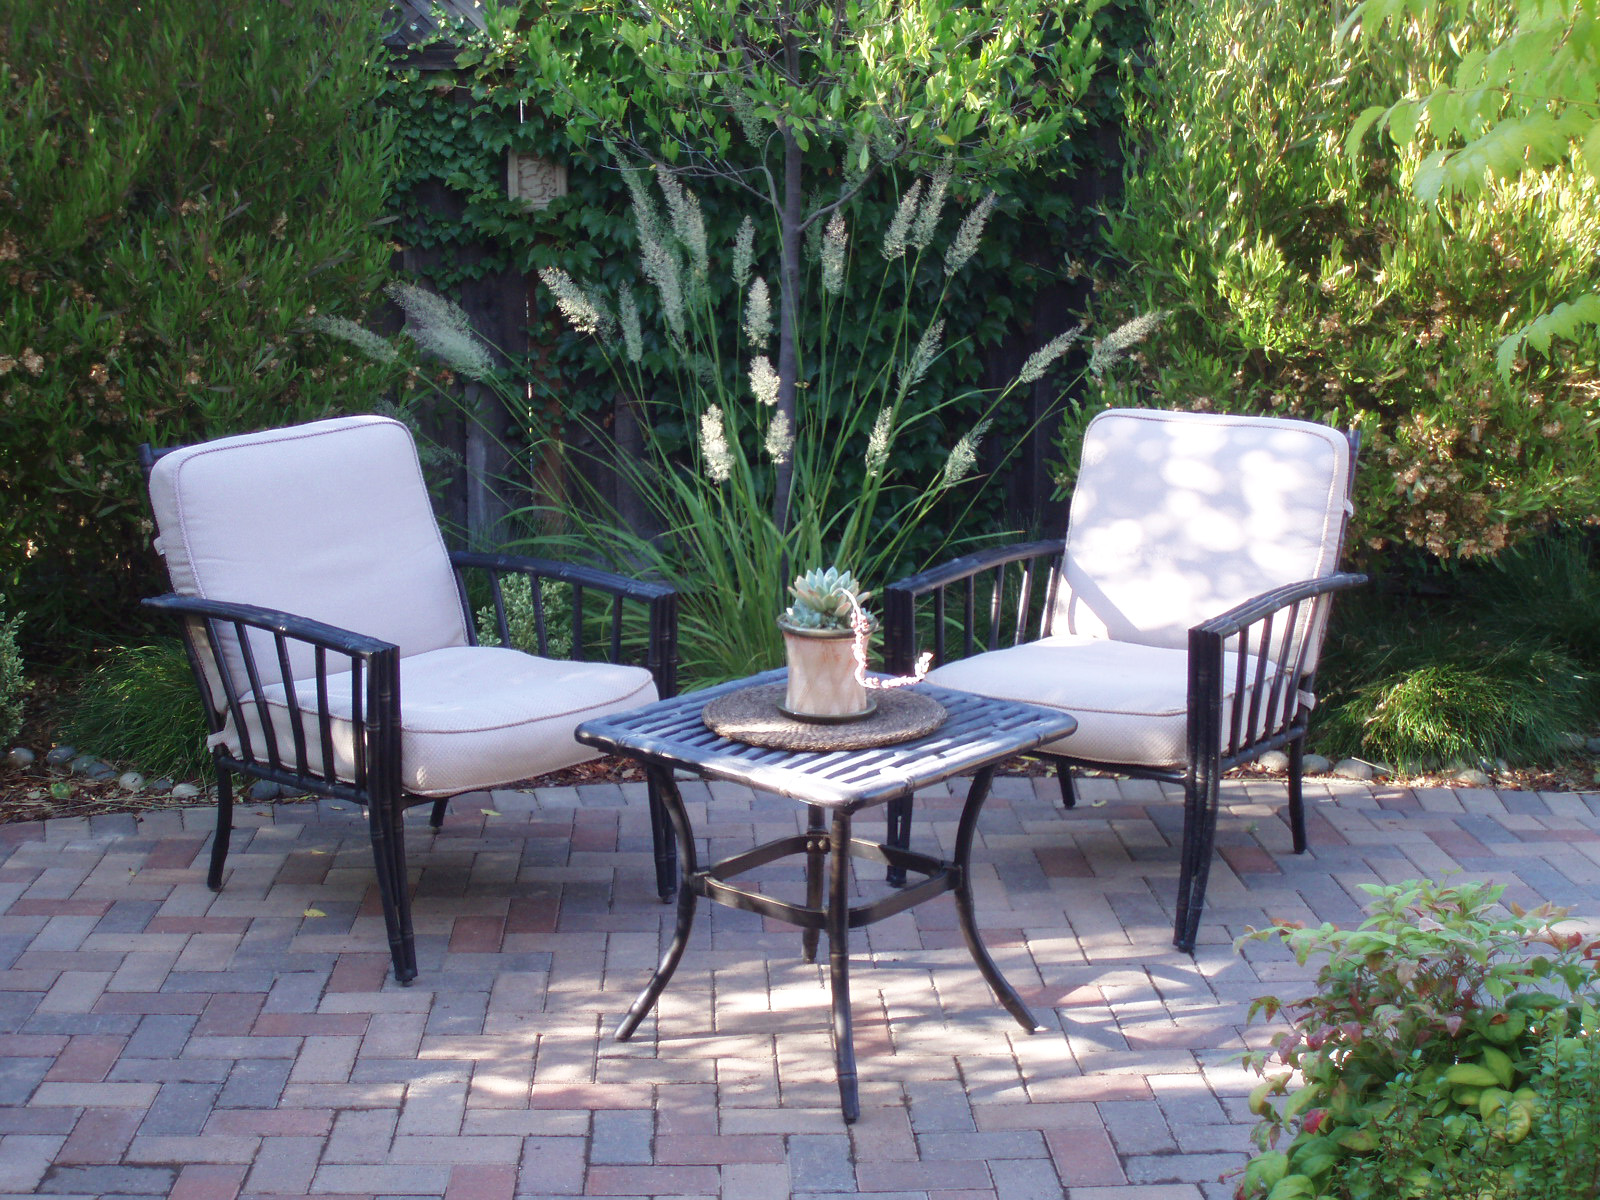 interleafings garden designers roundtable lawn alternatives. Black Bedroom Furniture Sets. Home Design Ideas